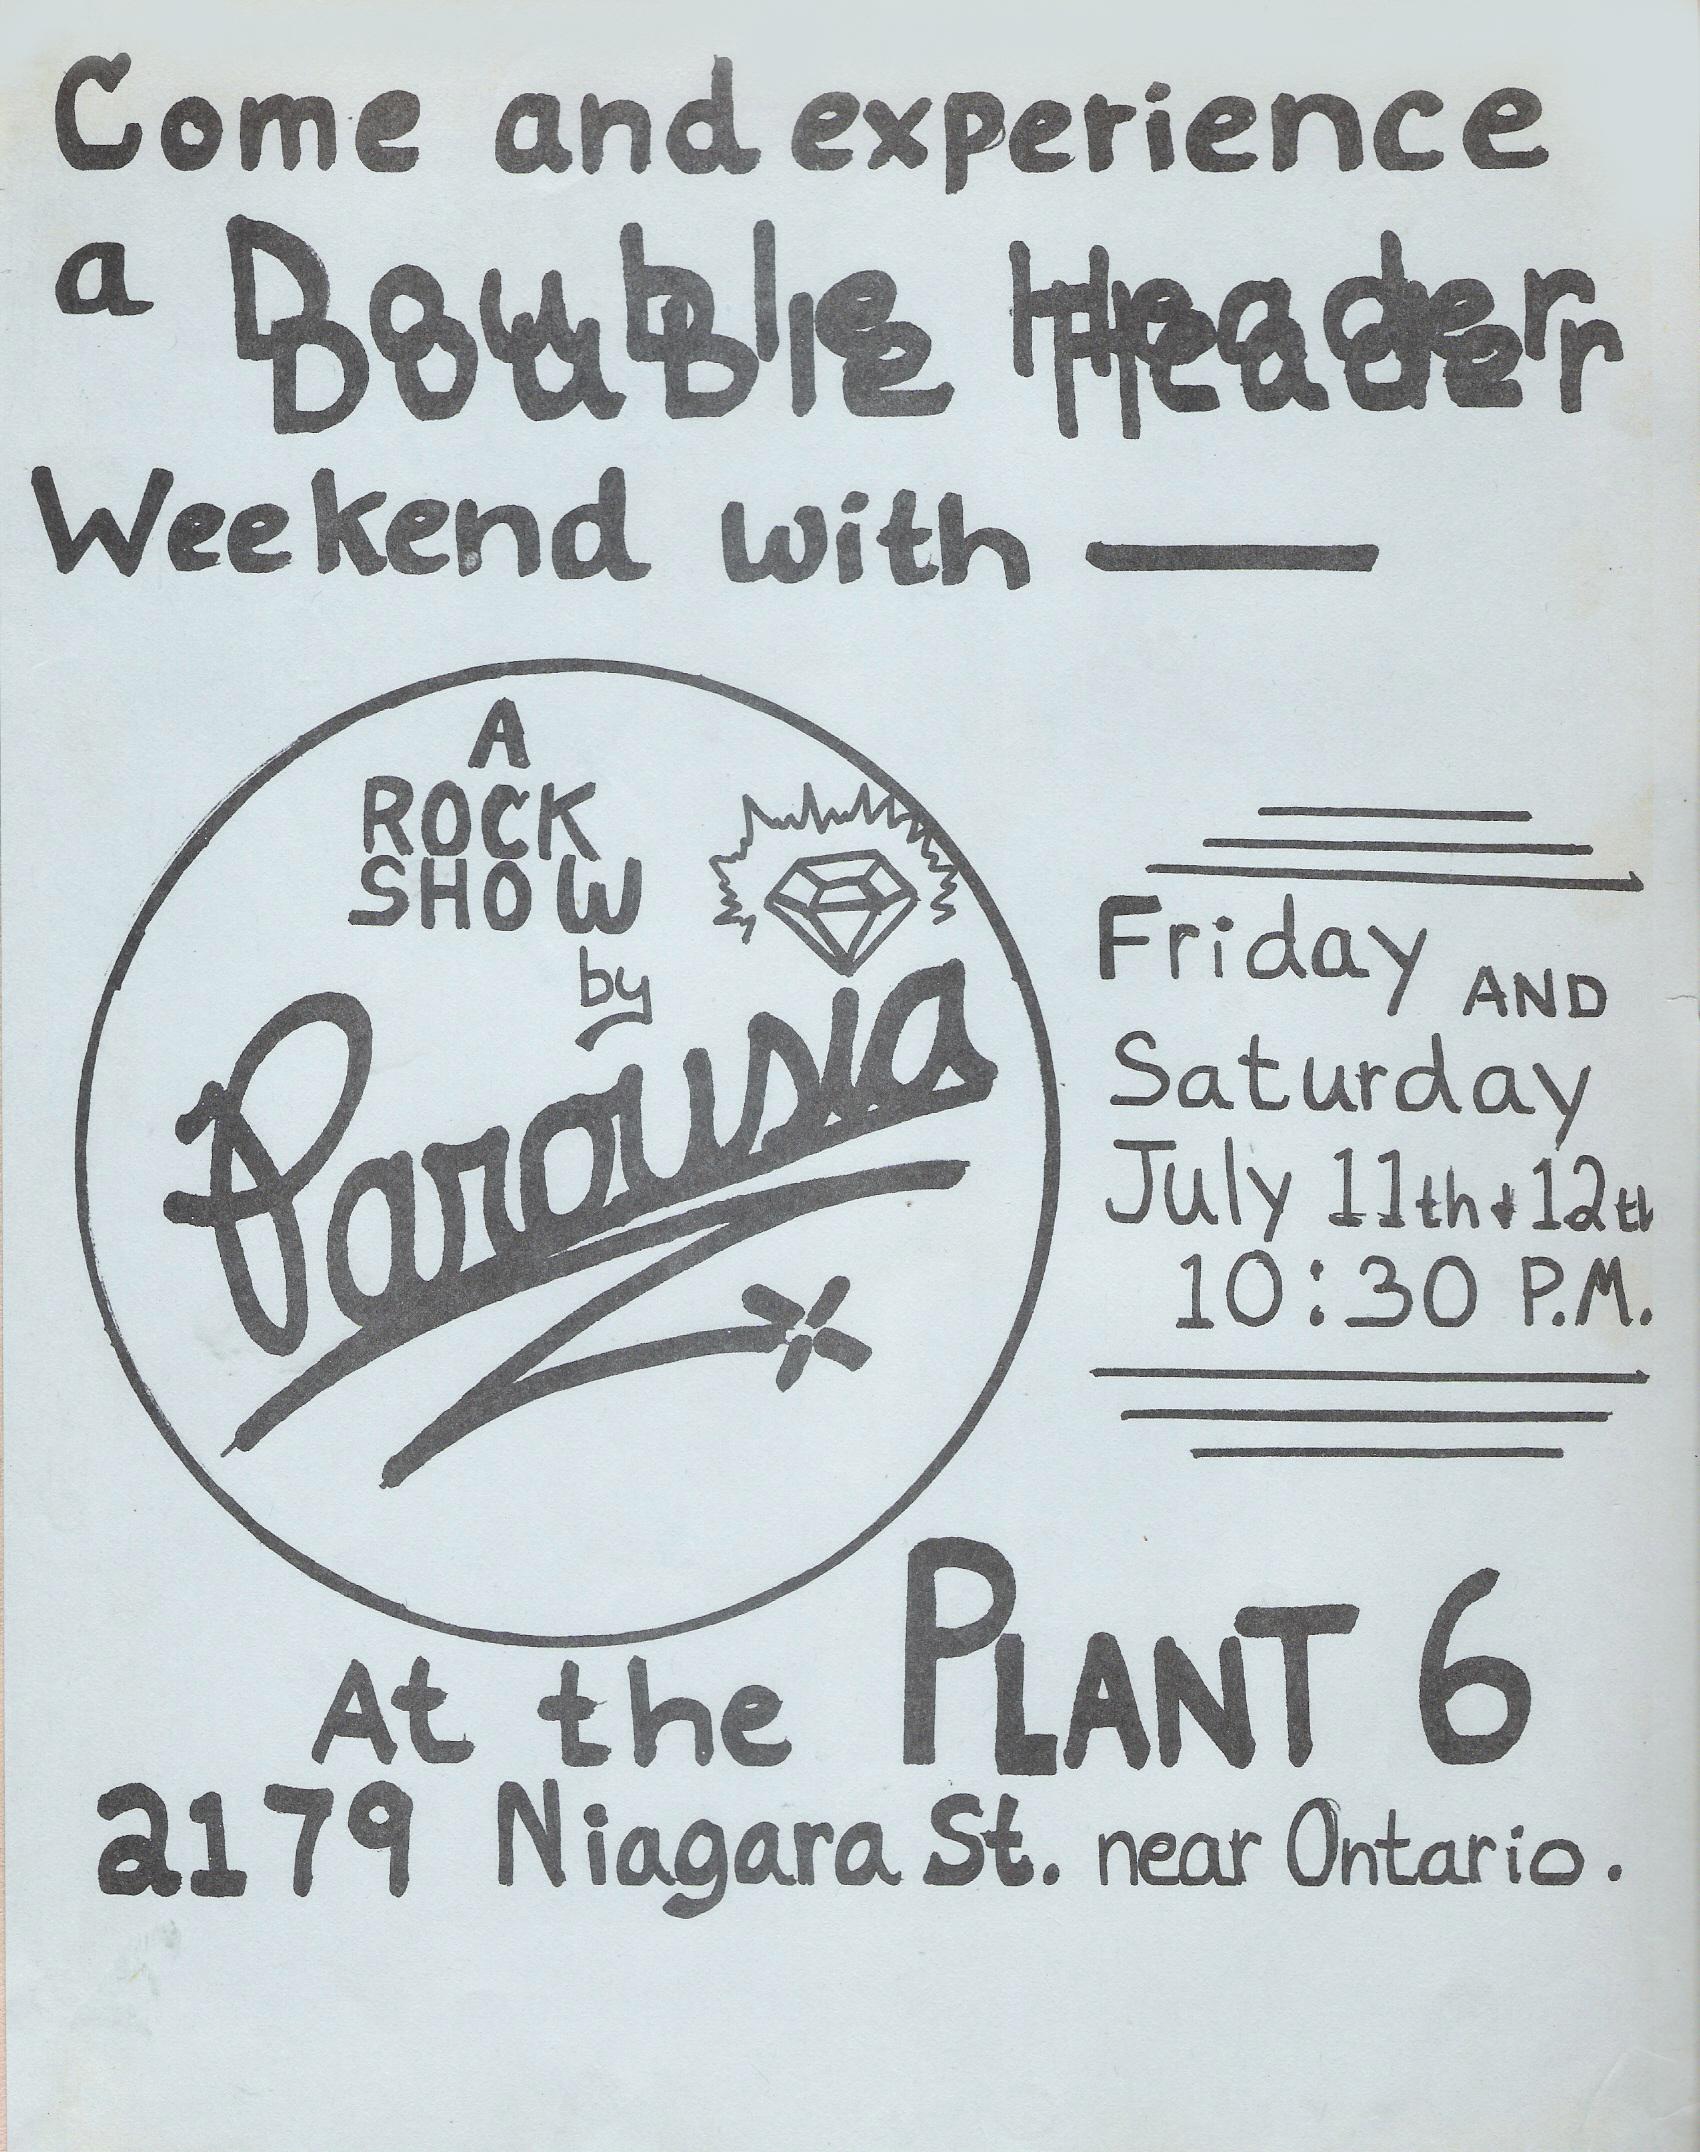 Parousia Flyer - Plant 6, (Niagara Street) July 11th & 12th 1980